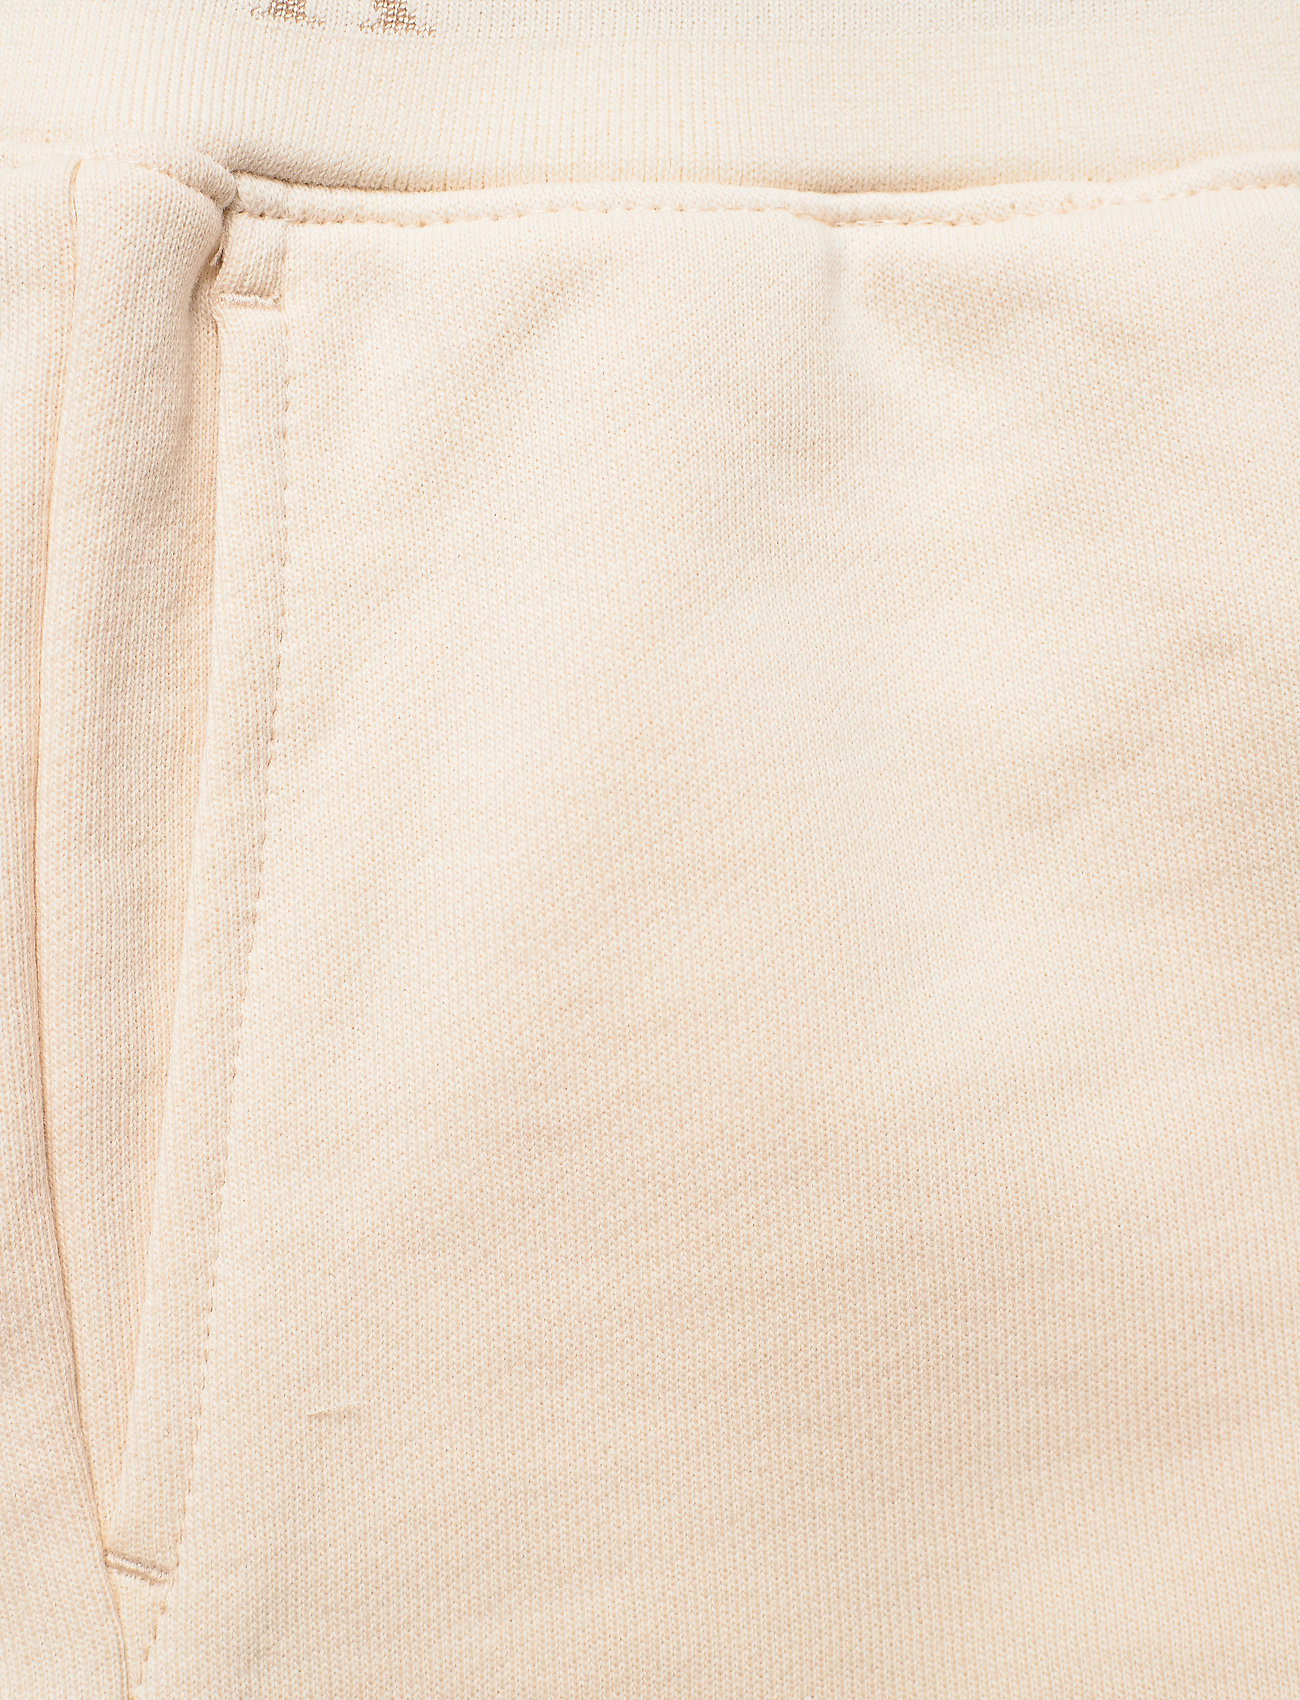 Calvin Klein Jeans - LOGO TRIM KNIT SHORT - casual shorts - white sand - 2